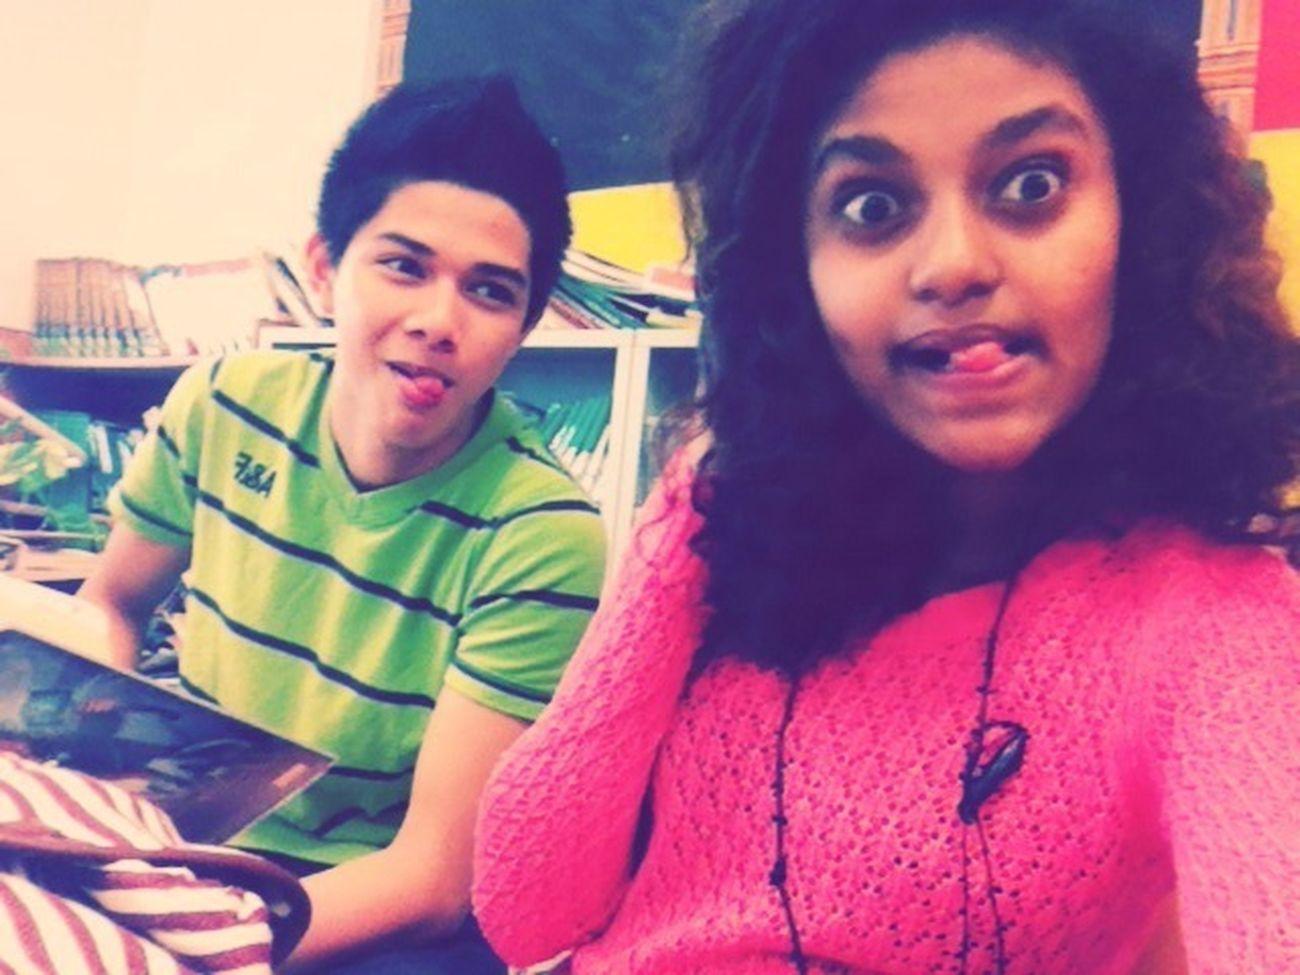 Lol We Crazy ❤